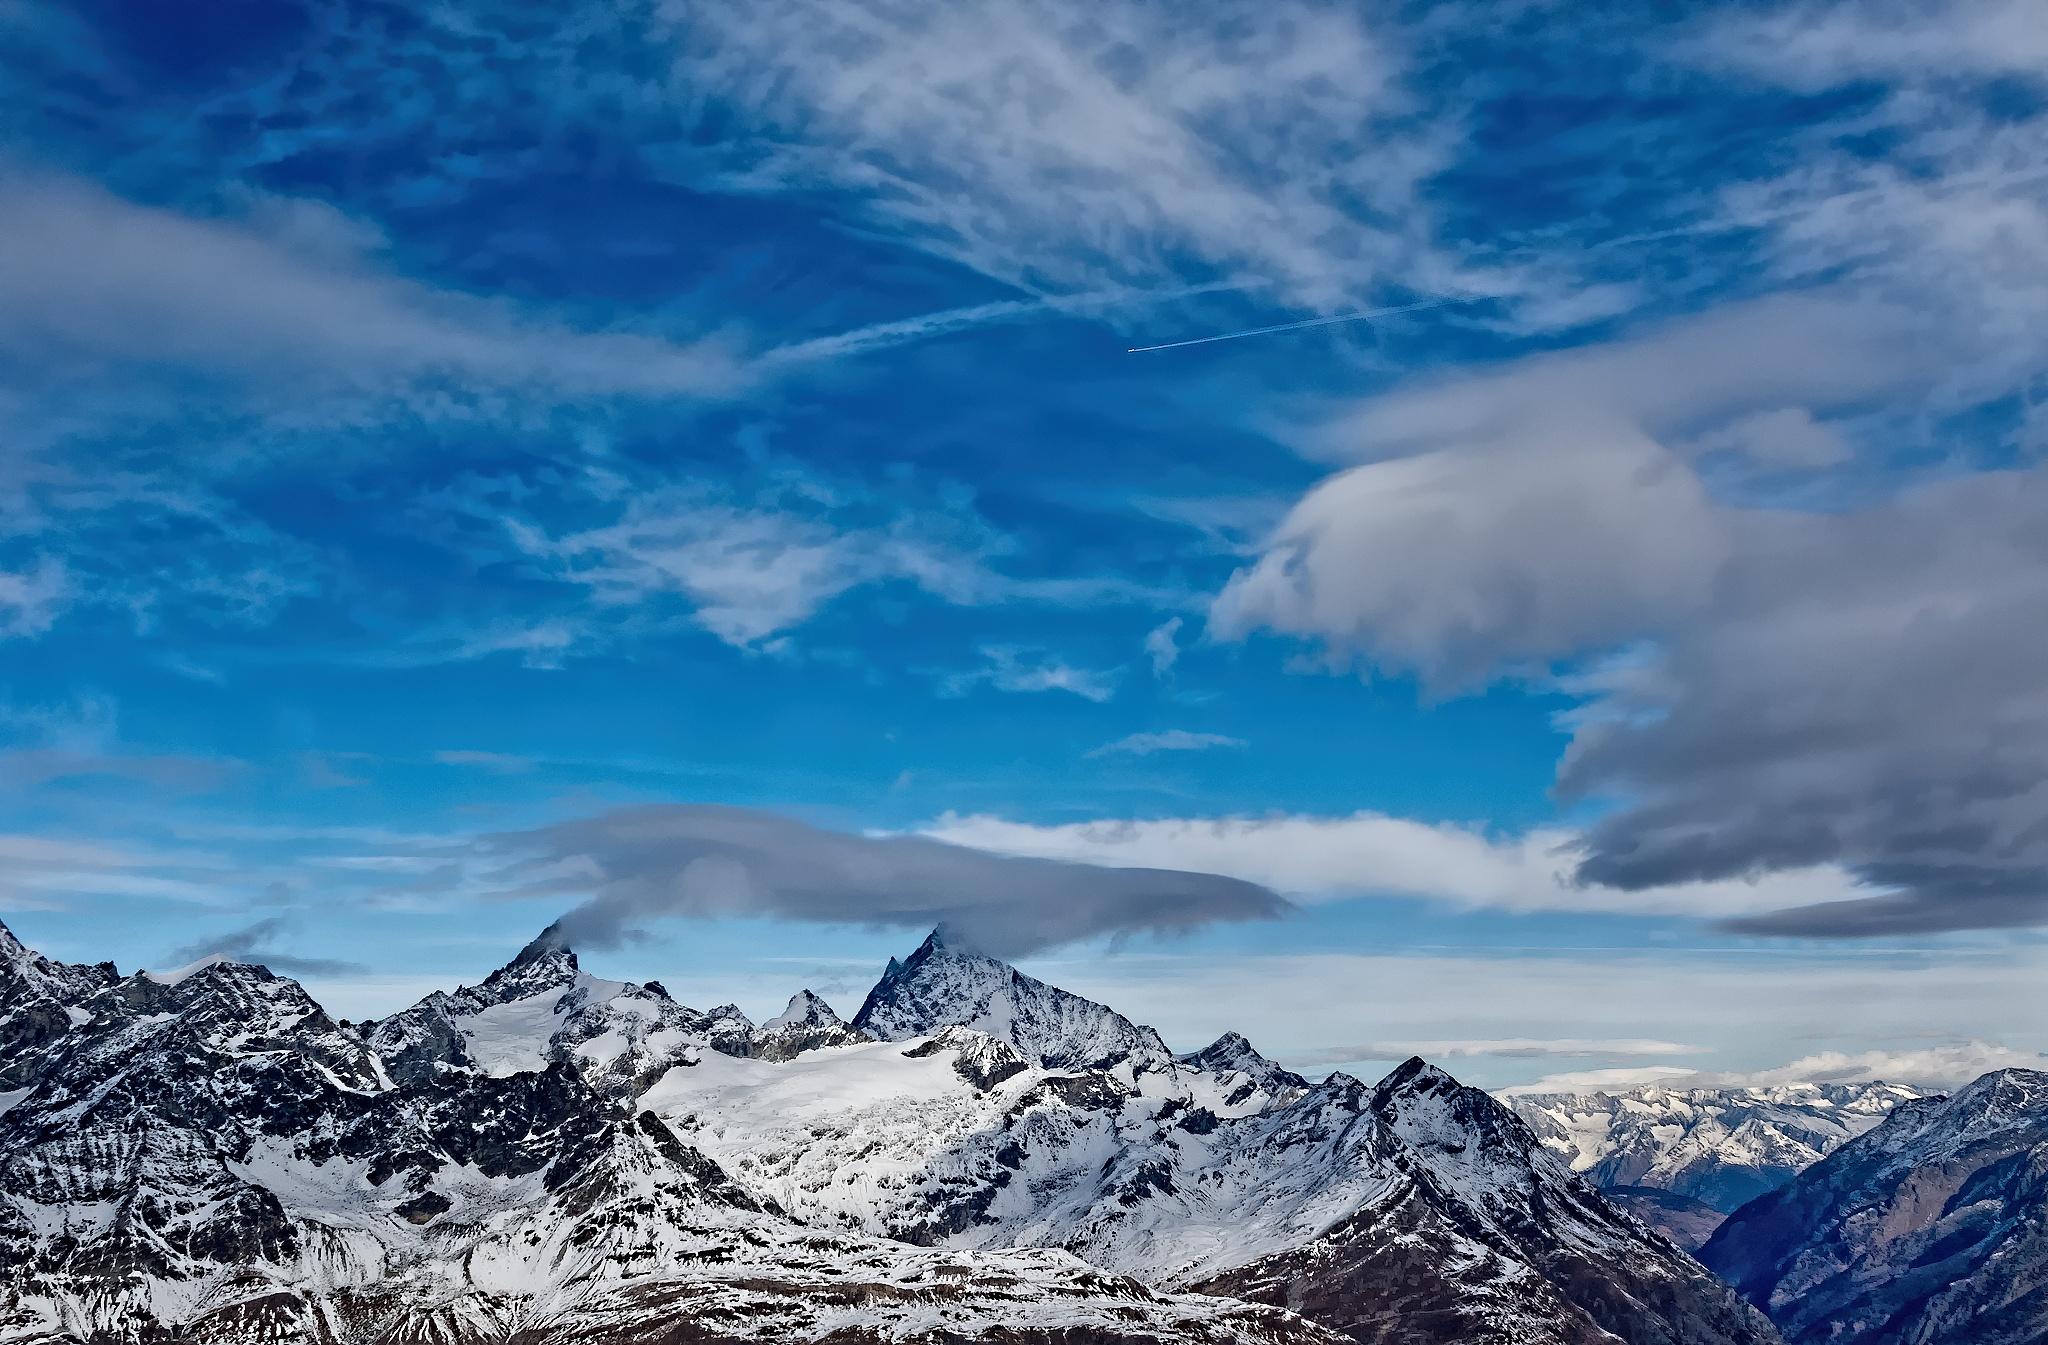 Cloudscape by Herbert Stachelberger